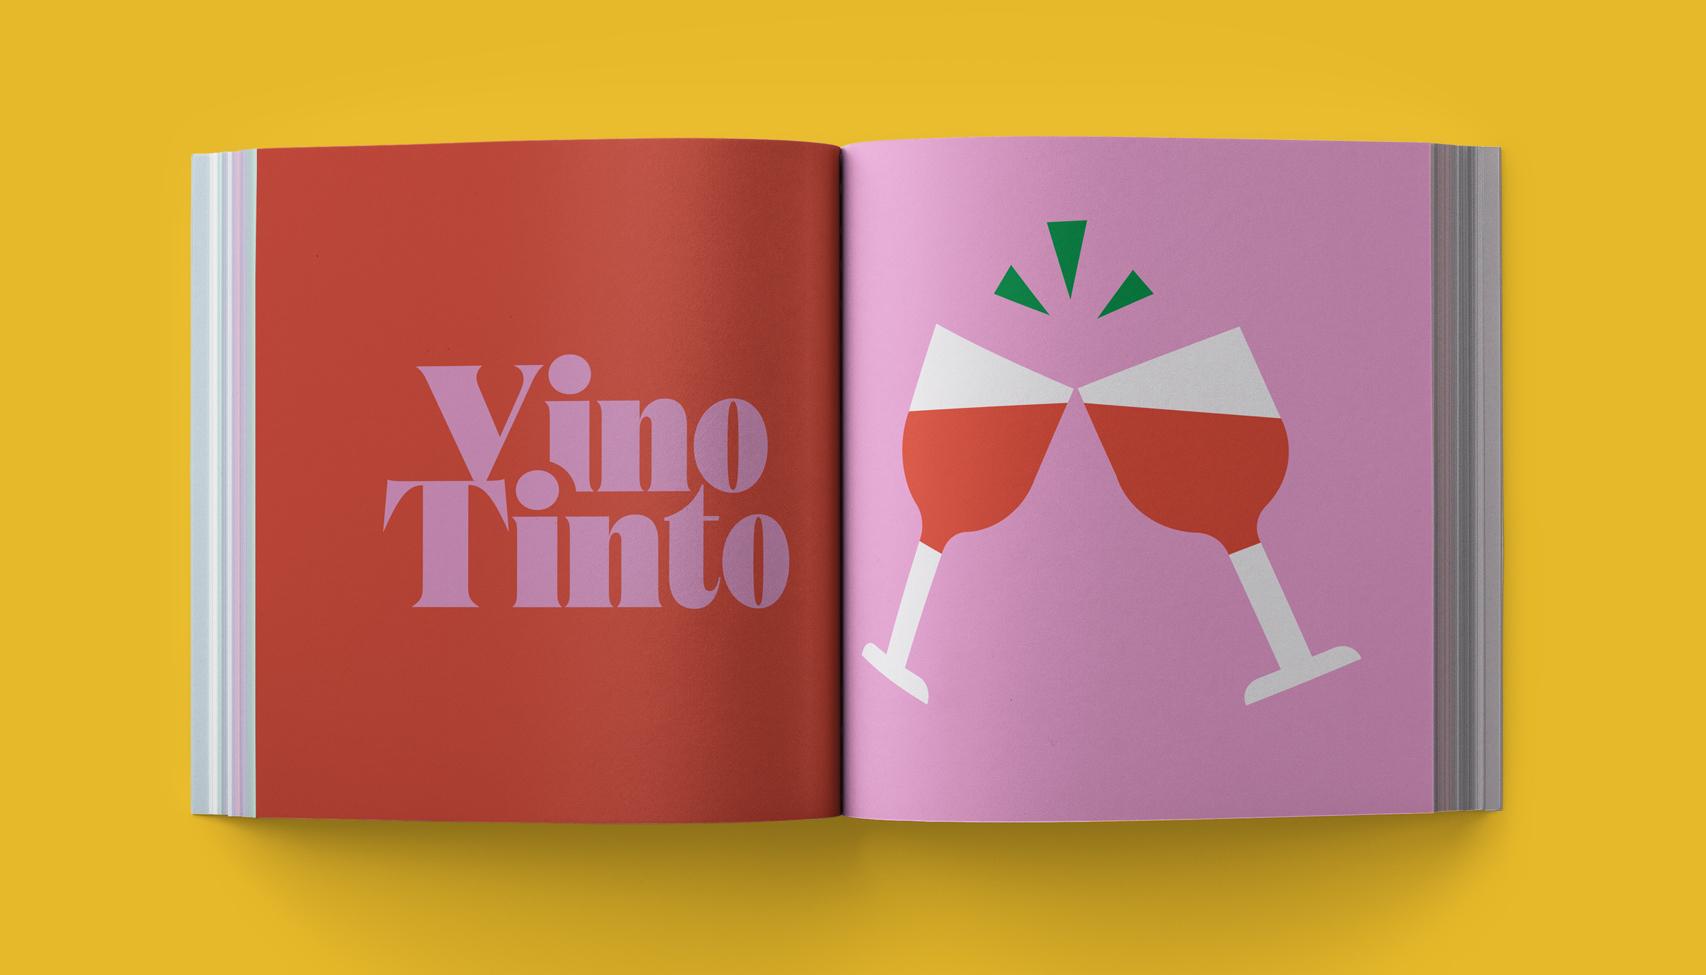 LK_2020_Site_Illustration_Espanol_Vino